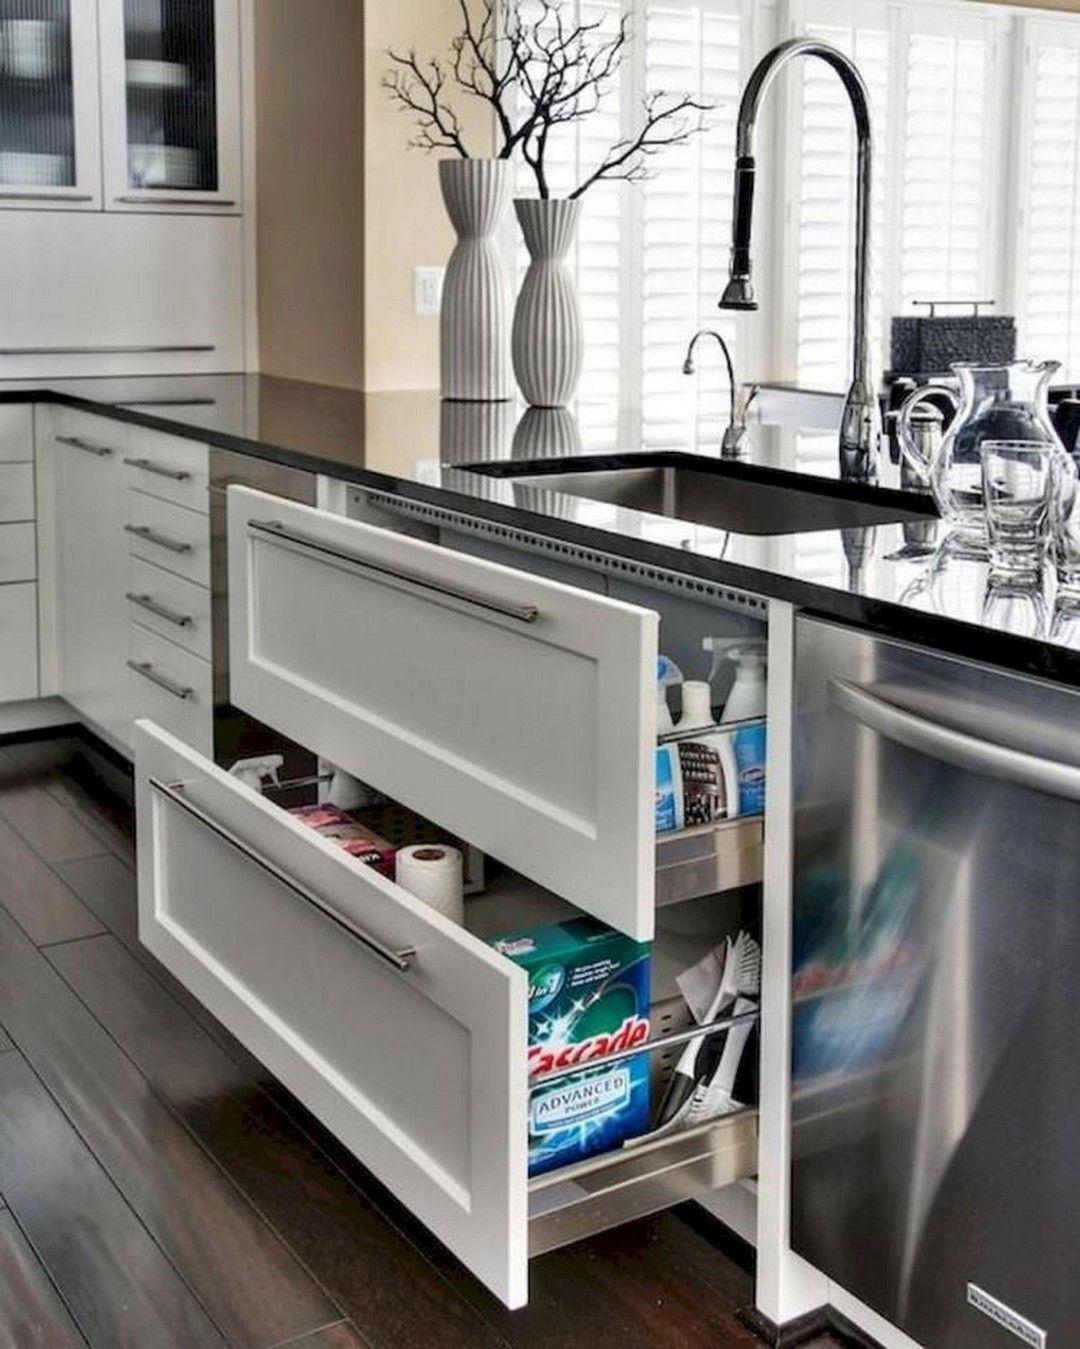 23 Kitchen Renovation Must Haves Ideas Inspiration Kitchen Design Home Kitchens Kitchen Remodel Kitchen remodel must haves